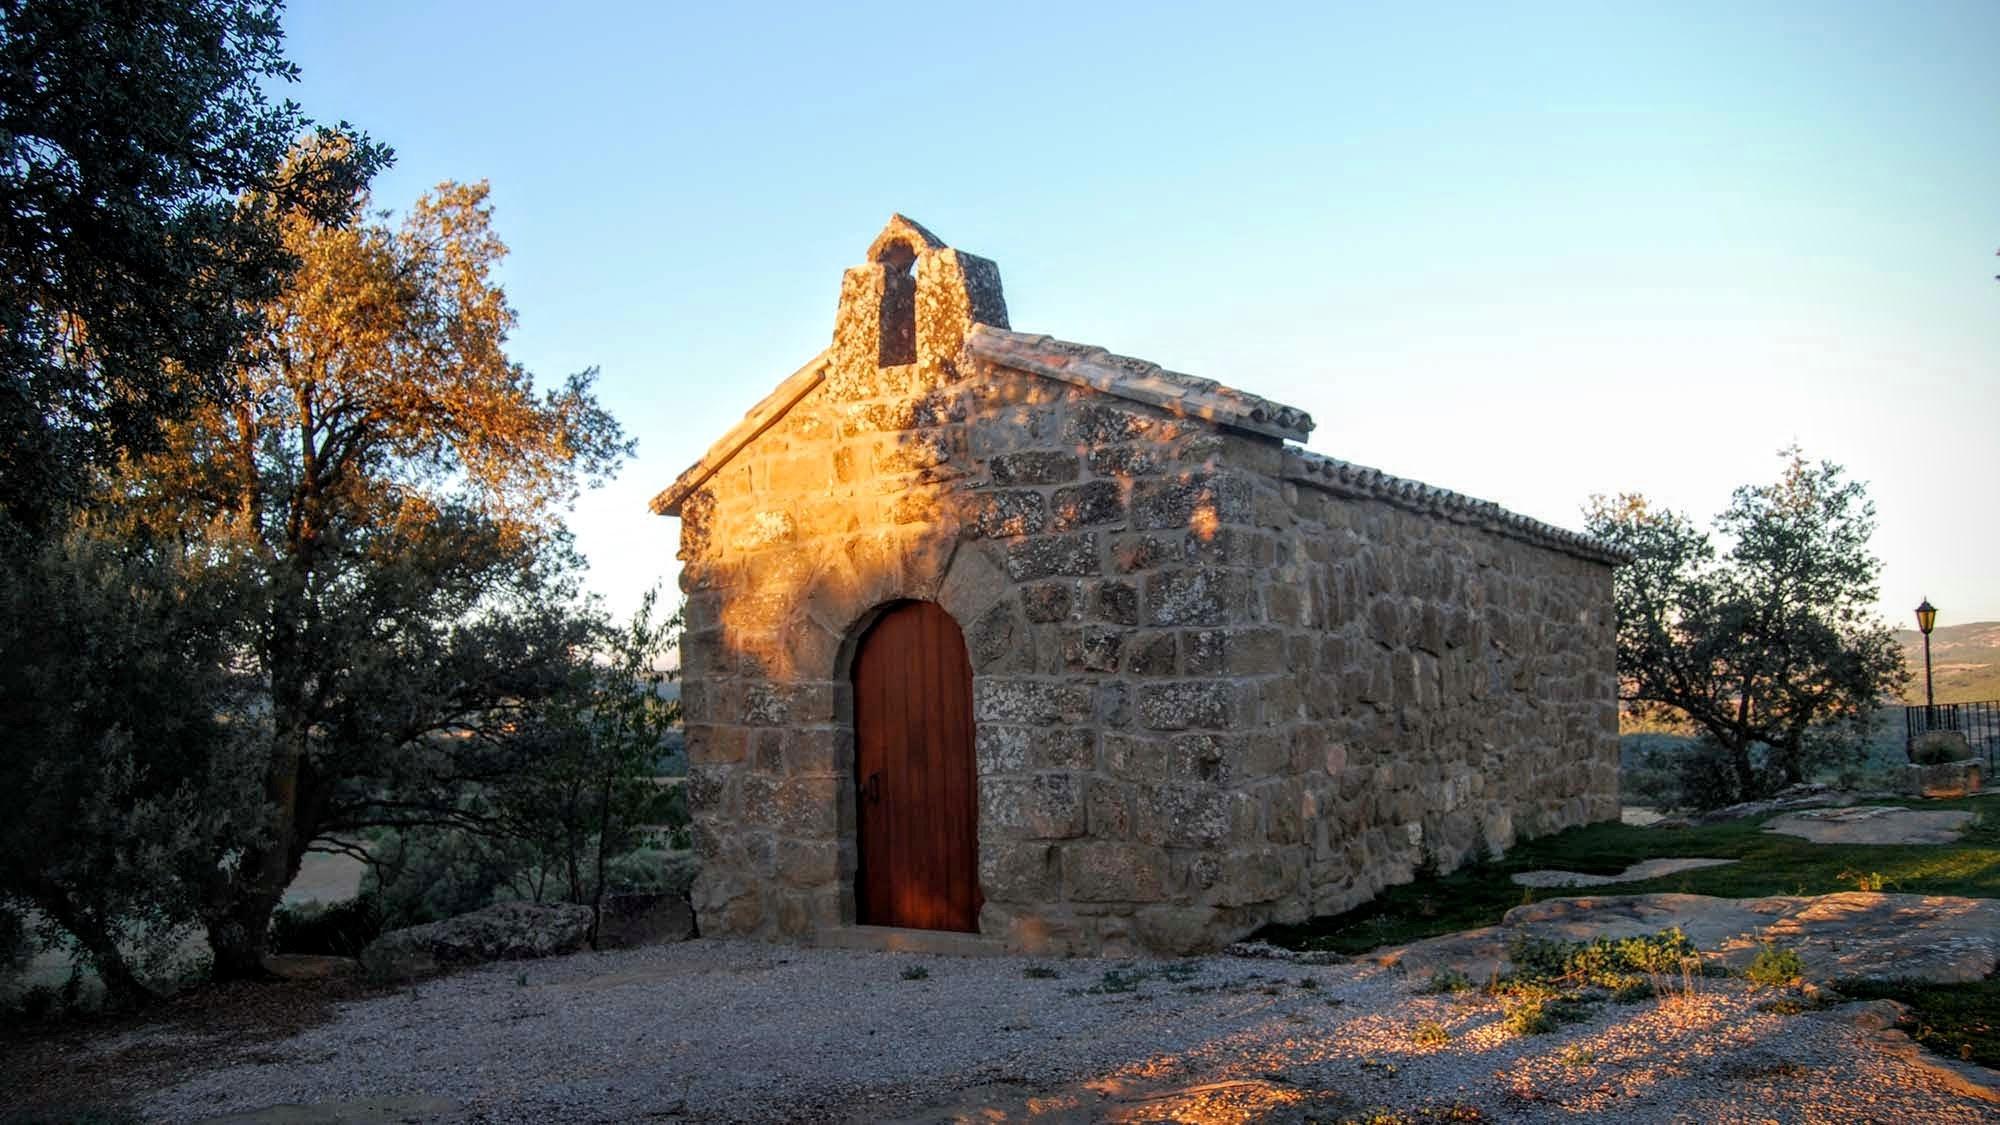 Capilla Sant Pere del Soler